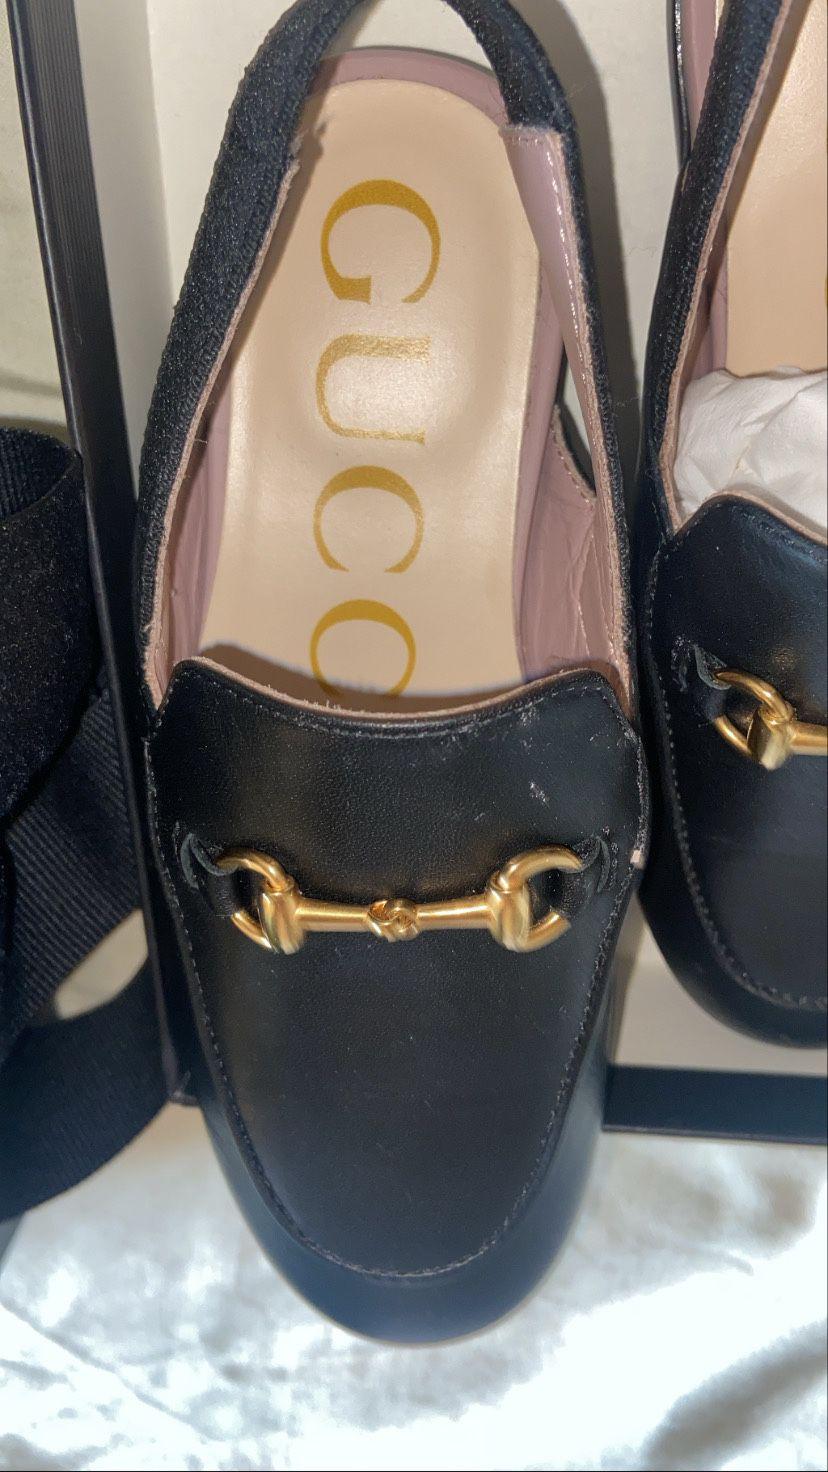 Gucci Dress Shoes Size 26